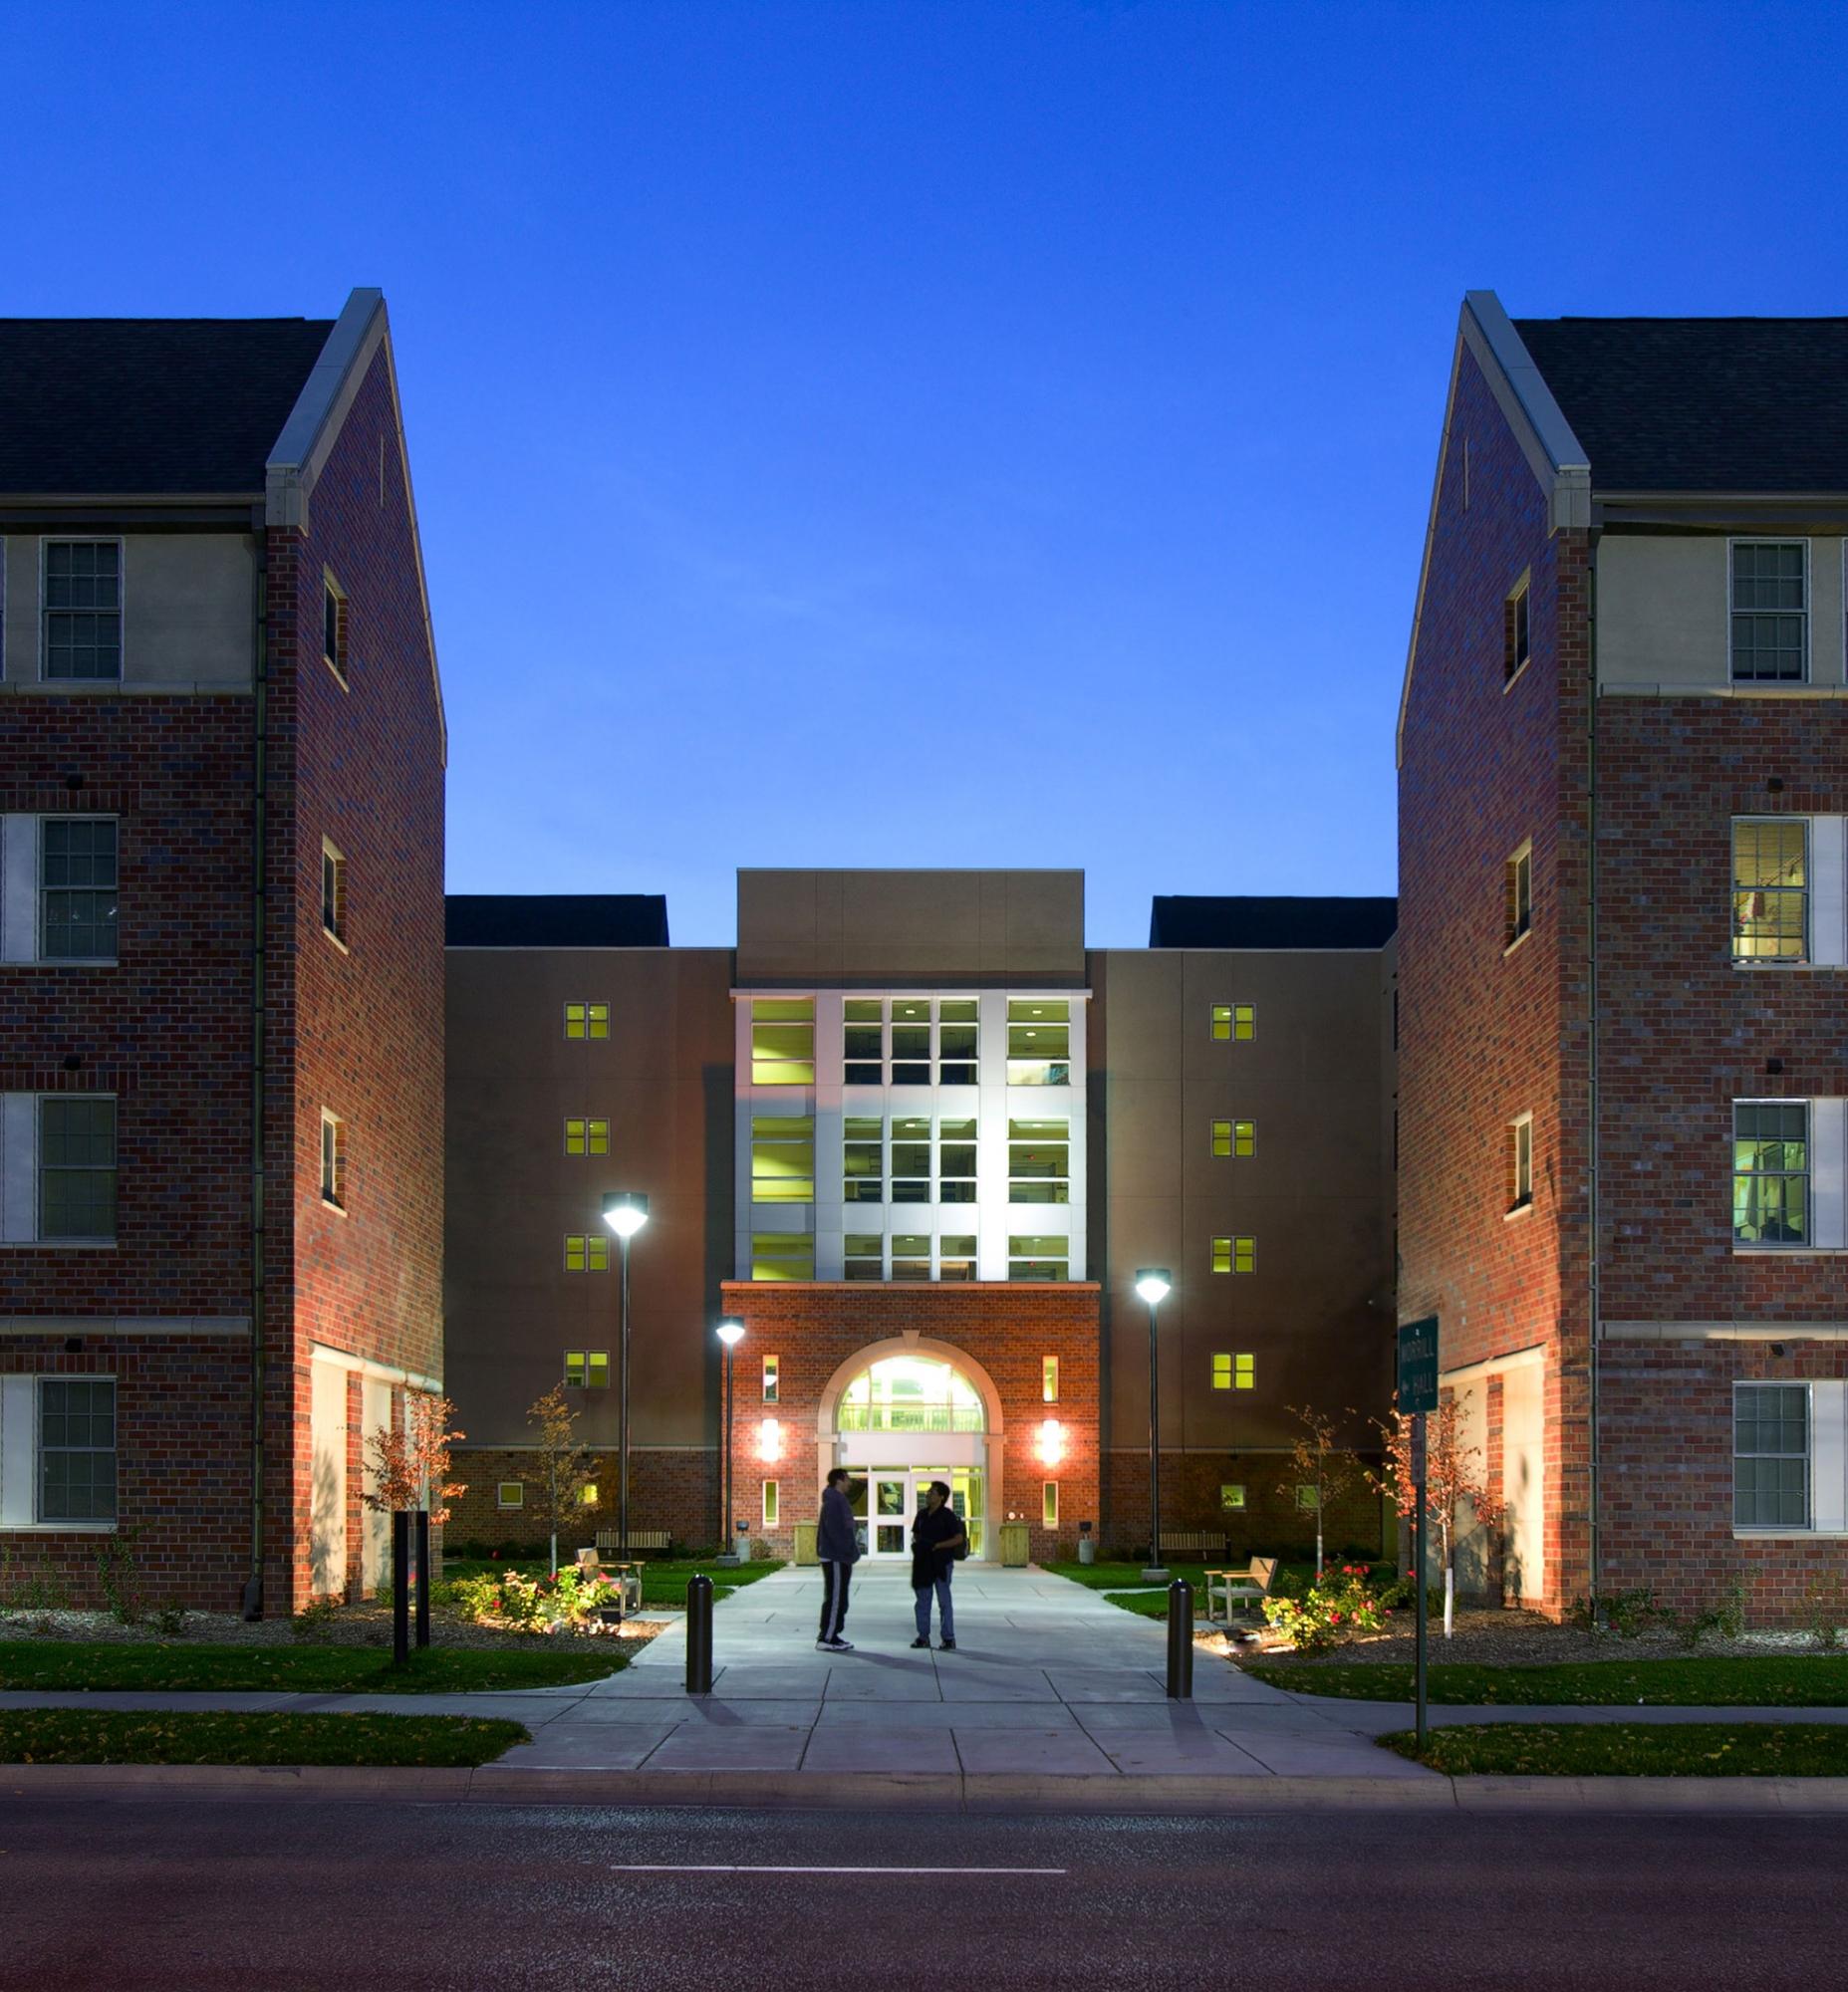 Sinclair Apartments: Sinclair Hille Architects - Architectural